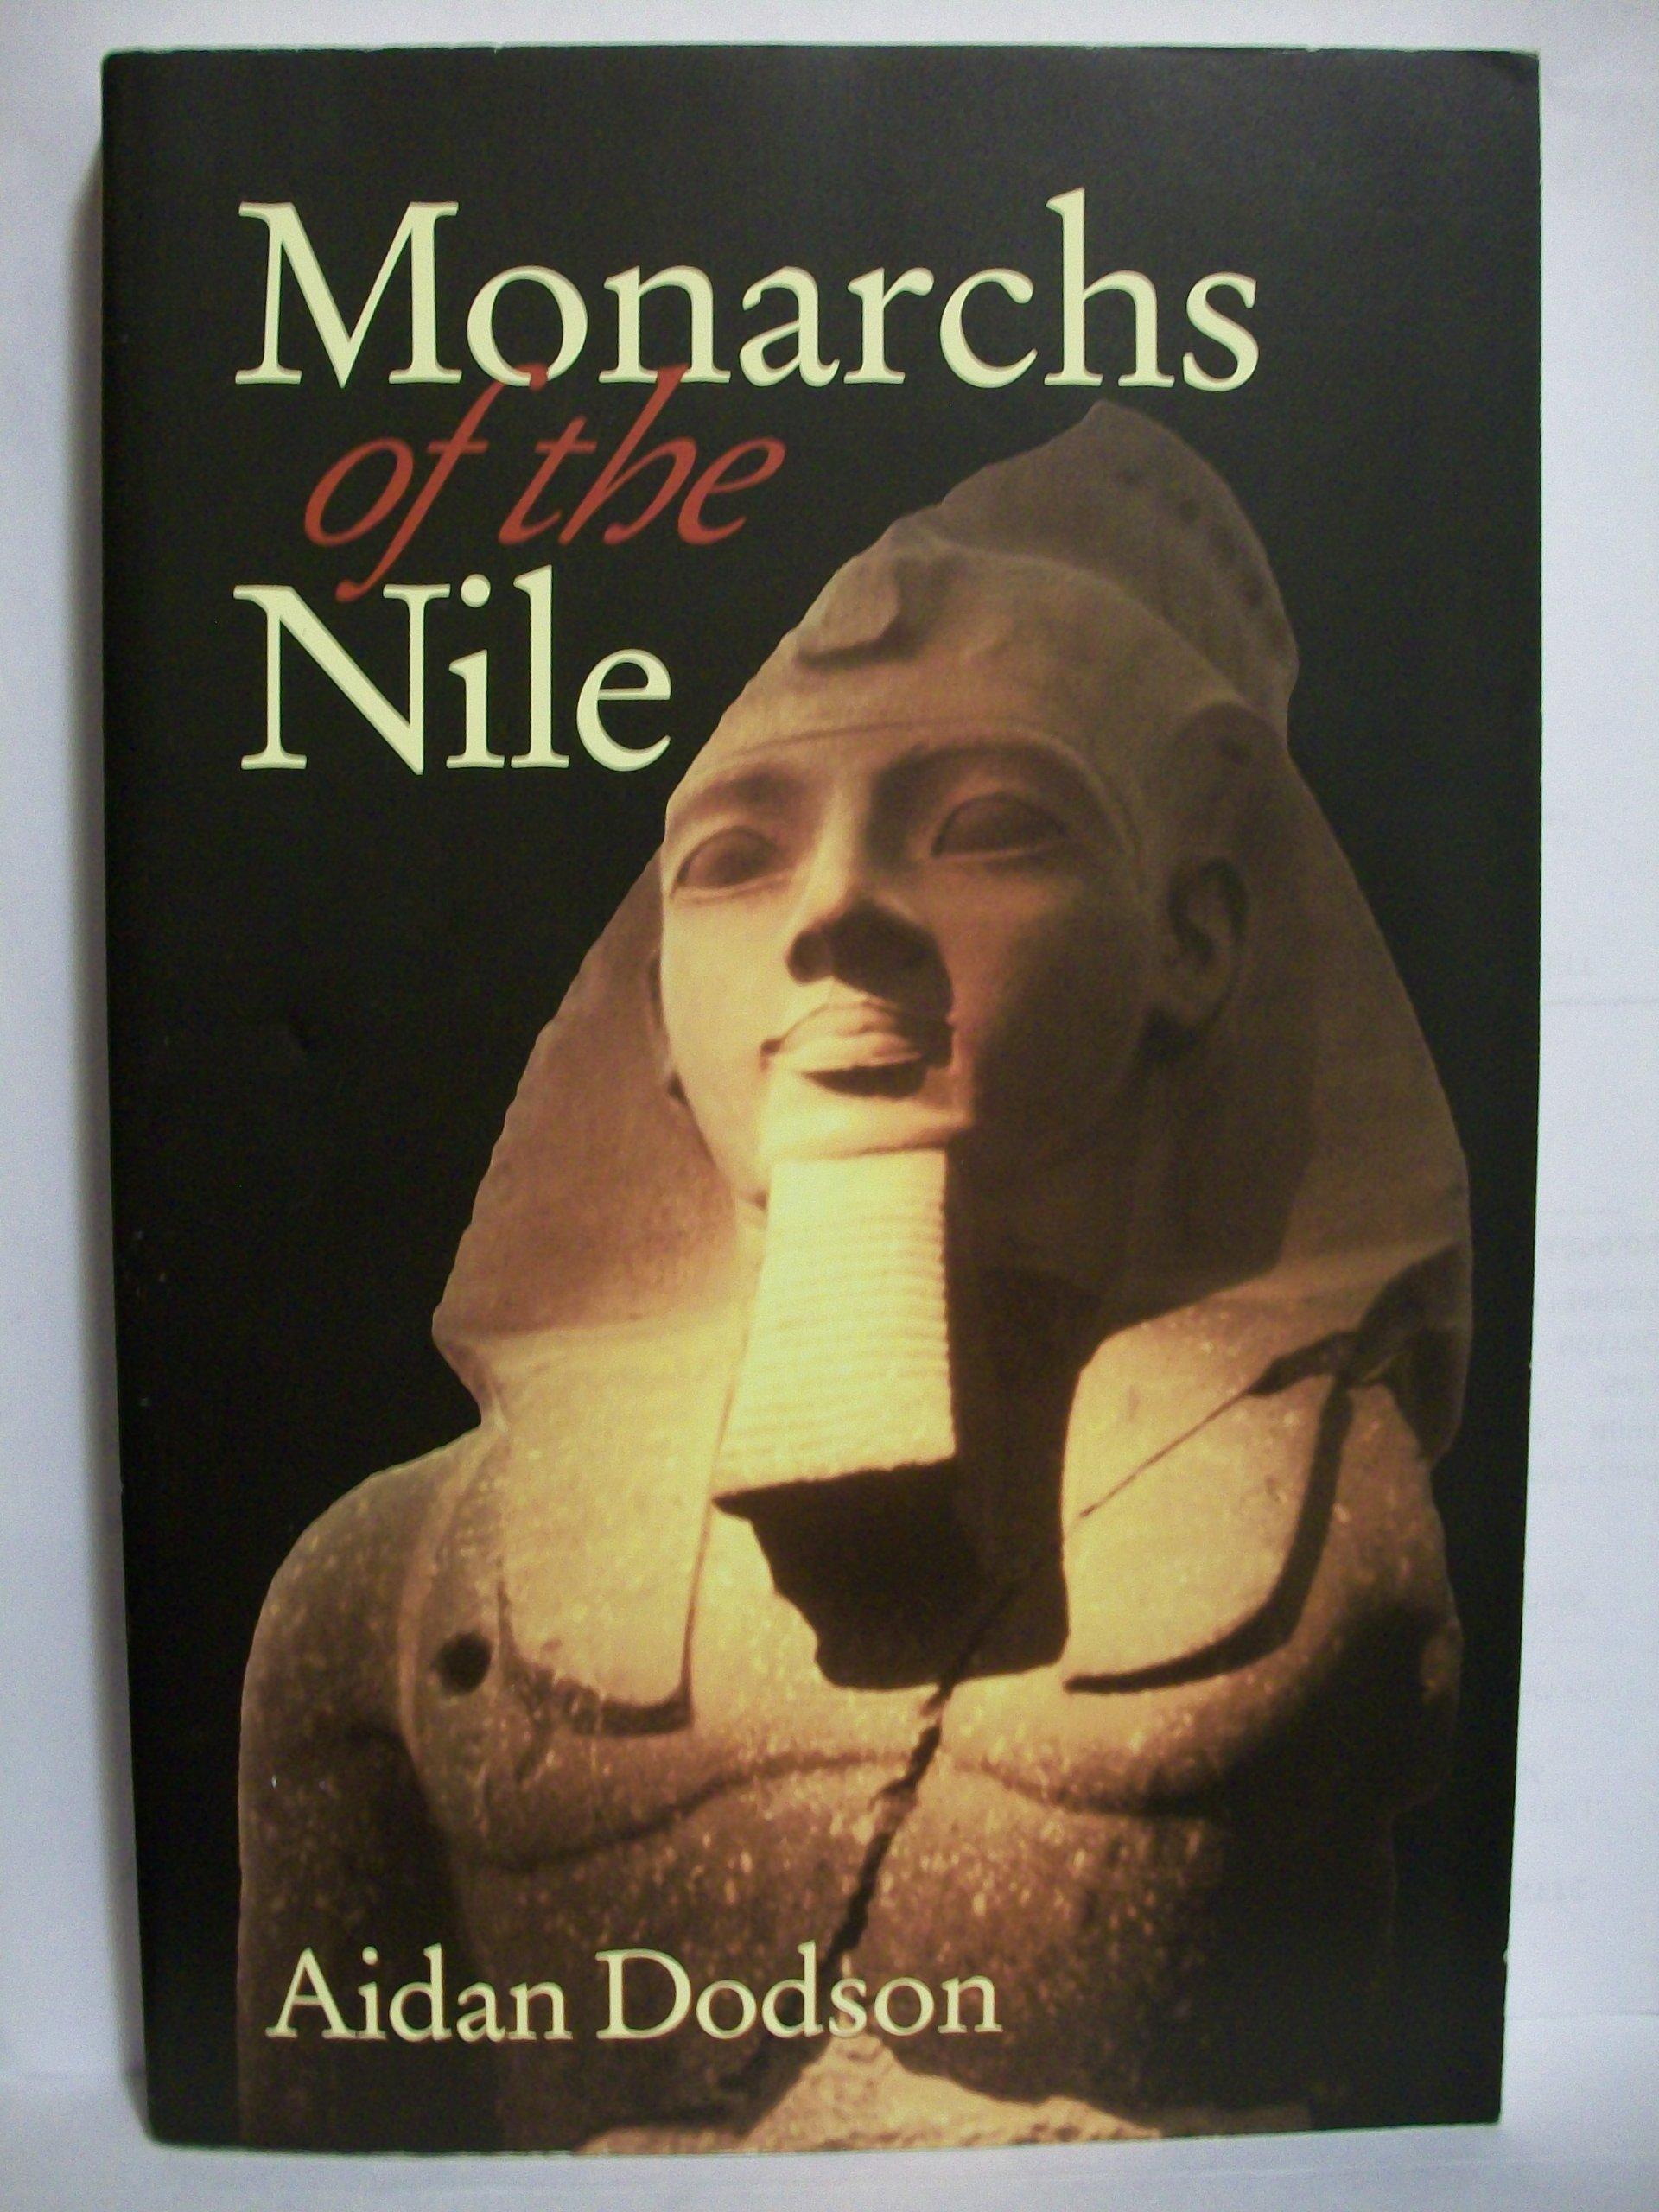 Monarchs of the Nile 2nd Revised Edition: Aidan Dodson: Amazon.com: Books